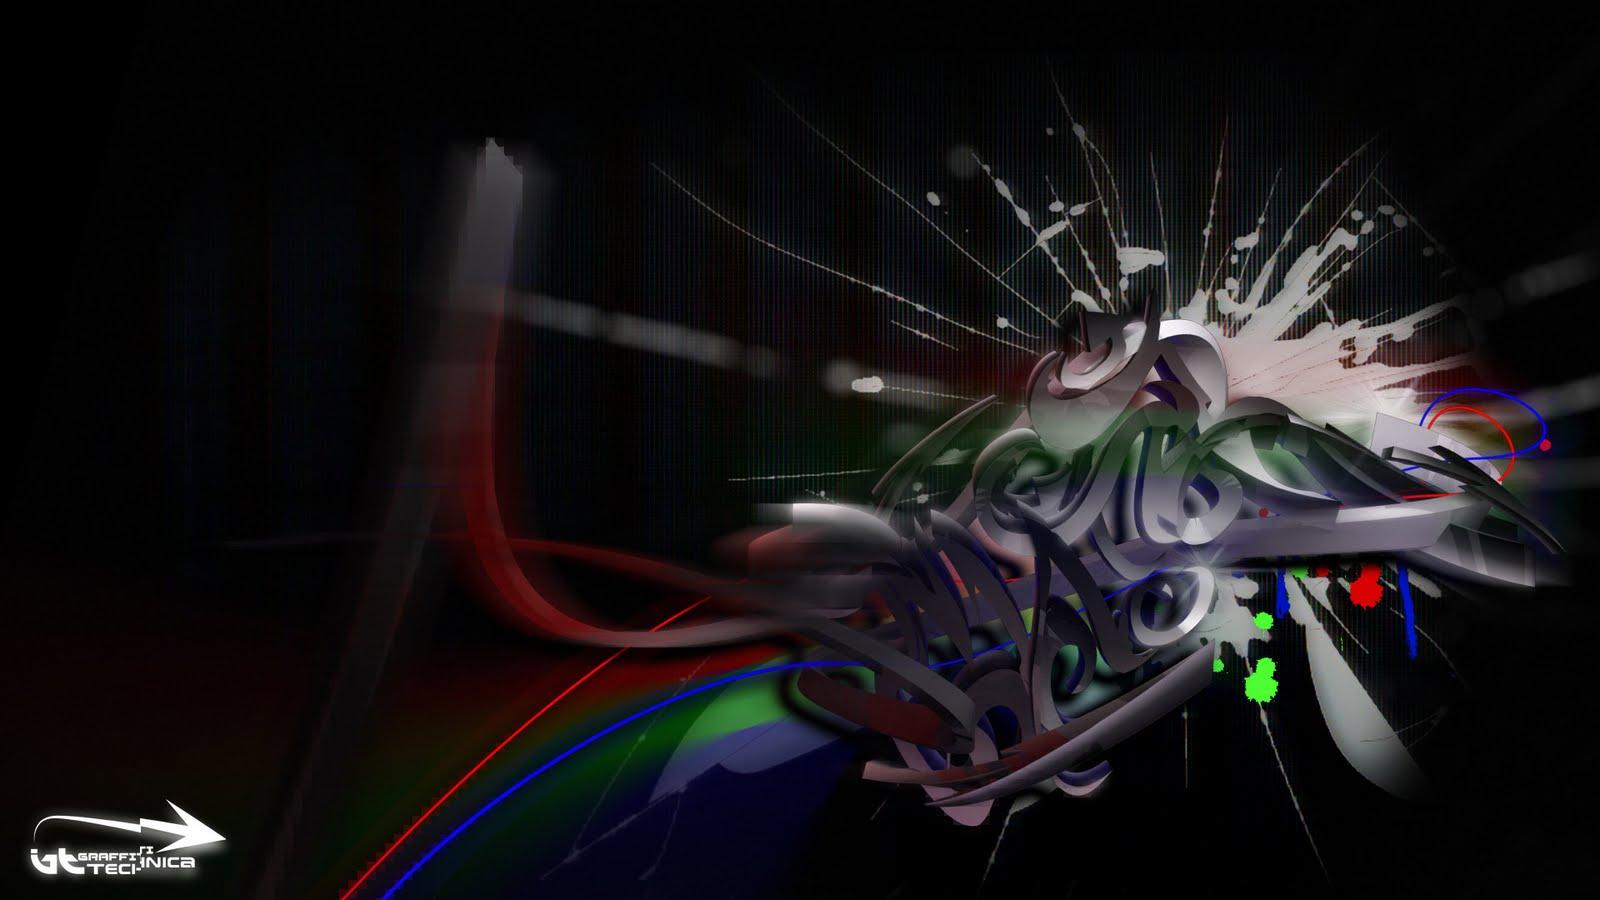 3D Graffiti Wallpapers HD  HD Wallpapers ,Backgrounds ...